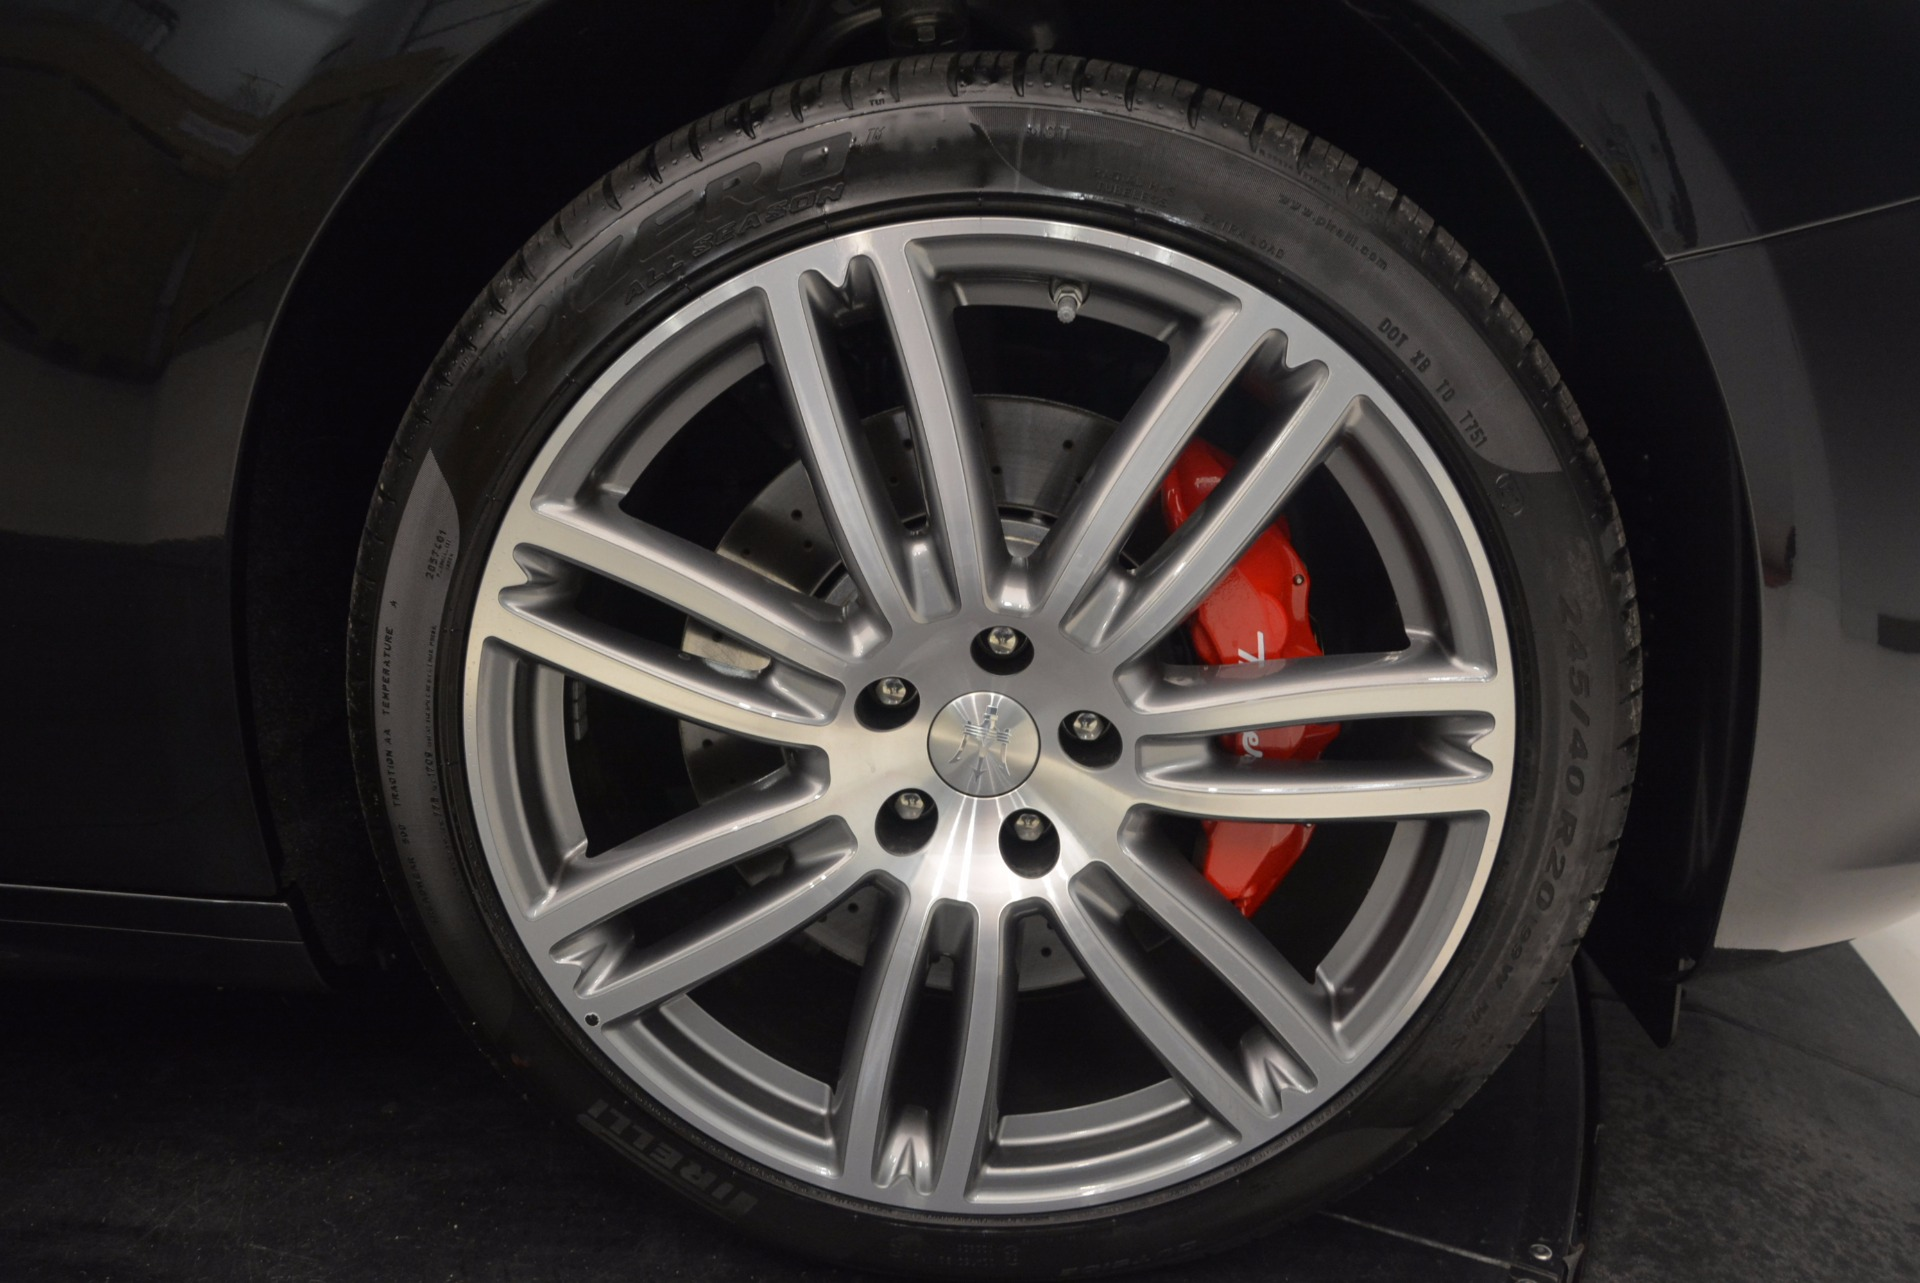 New 2018 Maserati Ghibli S Q4 GranSport For Sale In Greenwich, CT 1541_p25